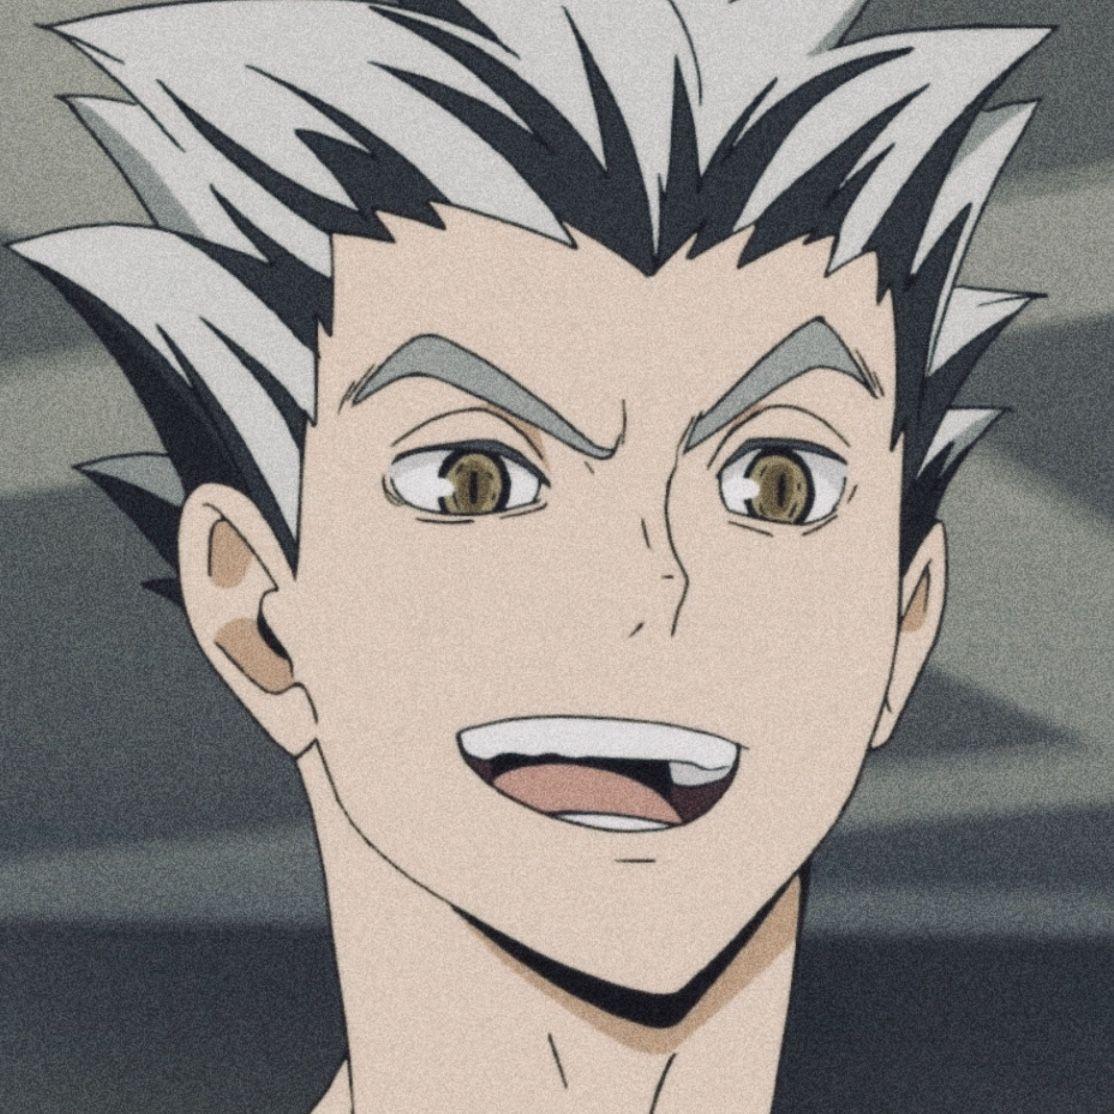 Aesthetic 90s Anime Pfp